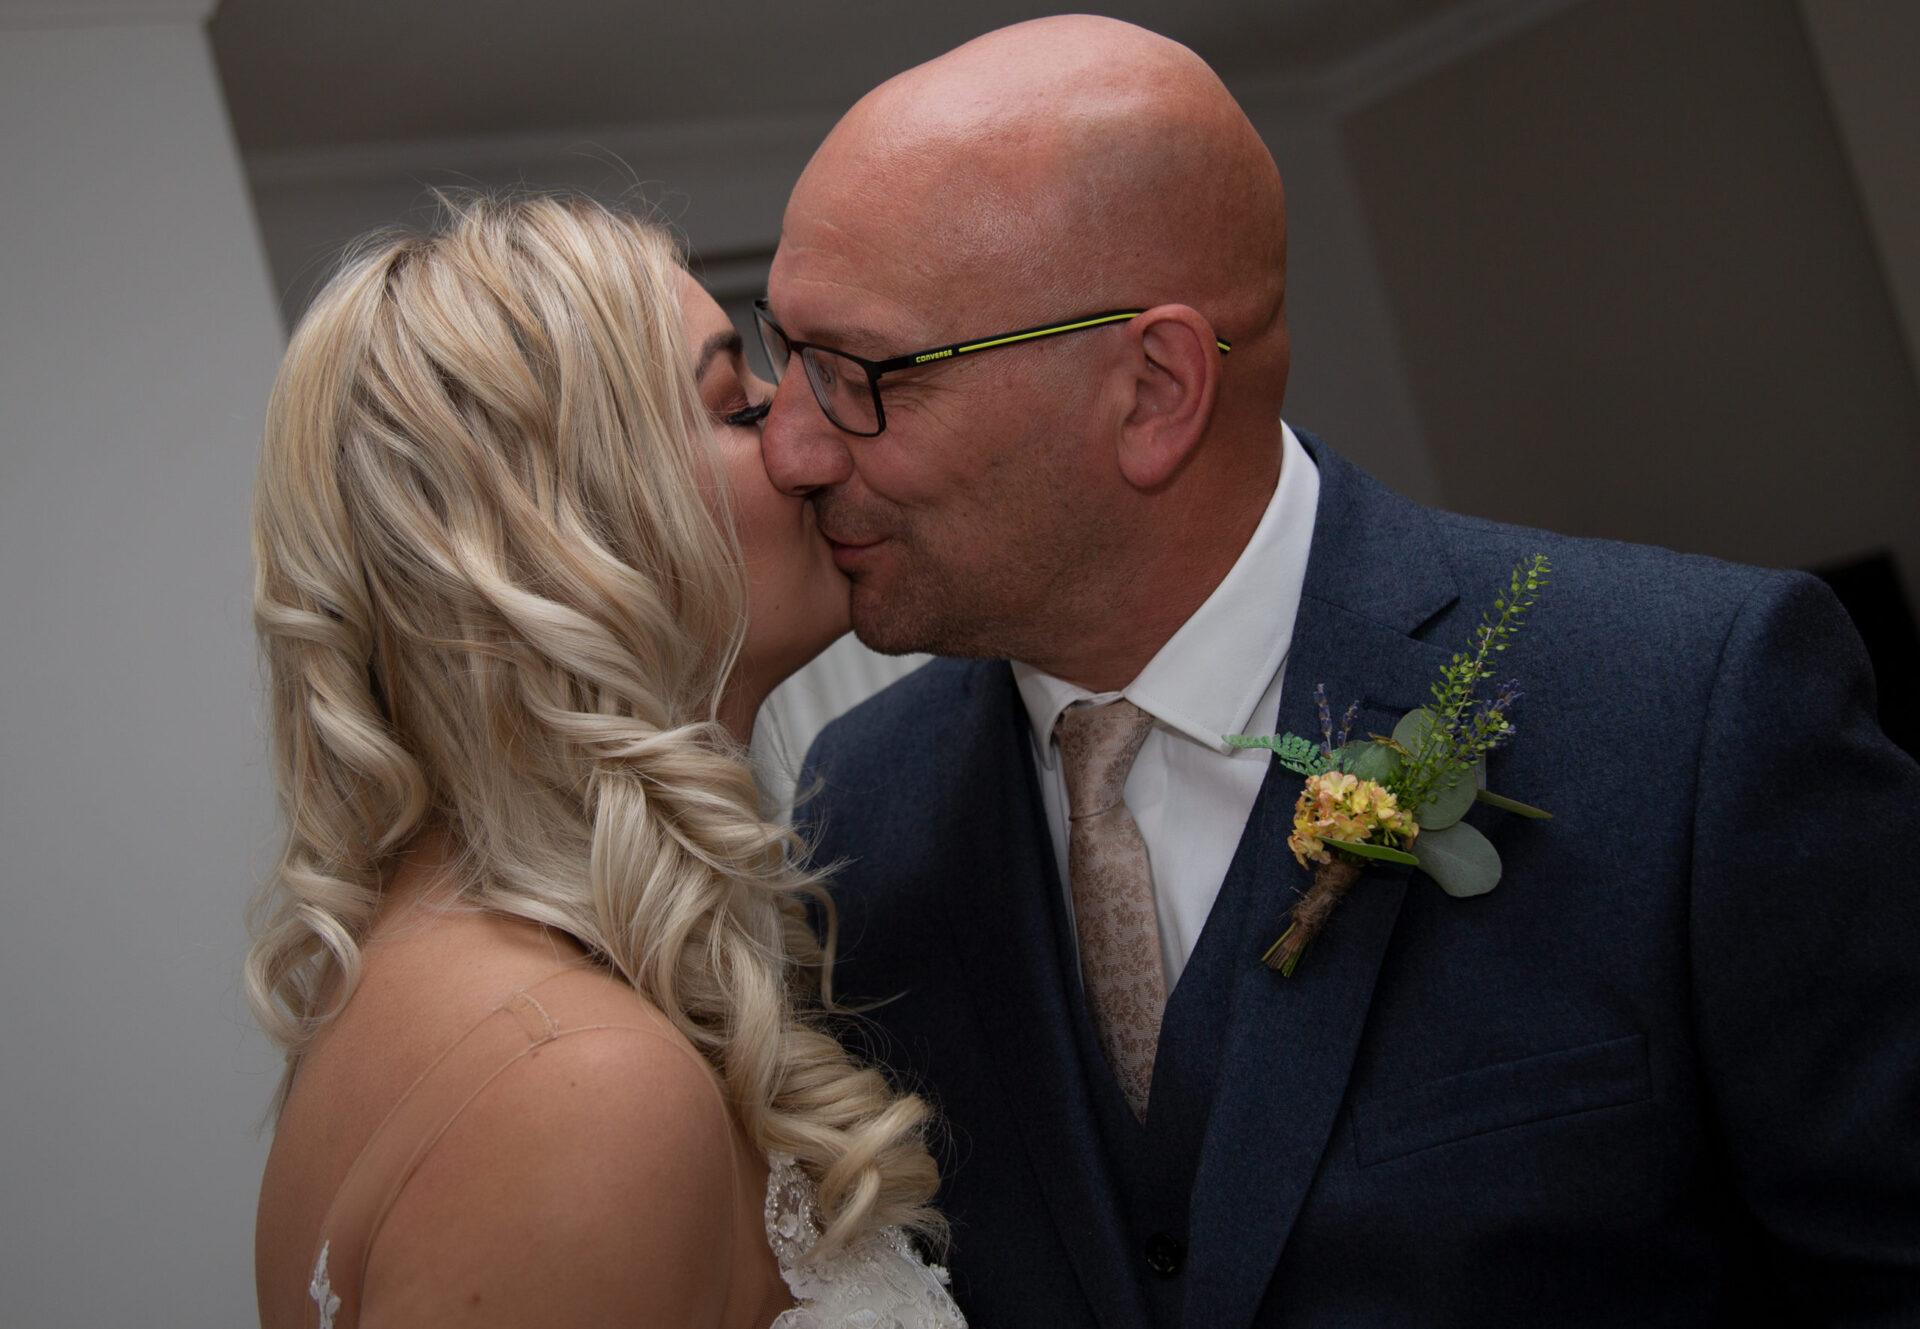 Wedding Photographer in North East UK